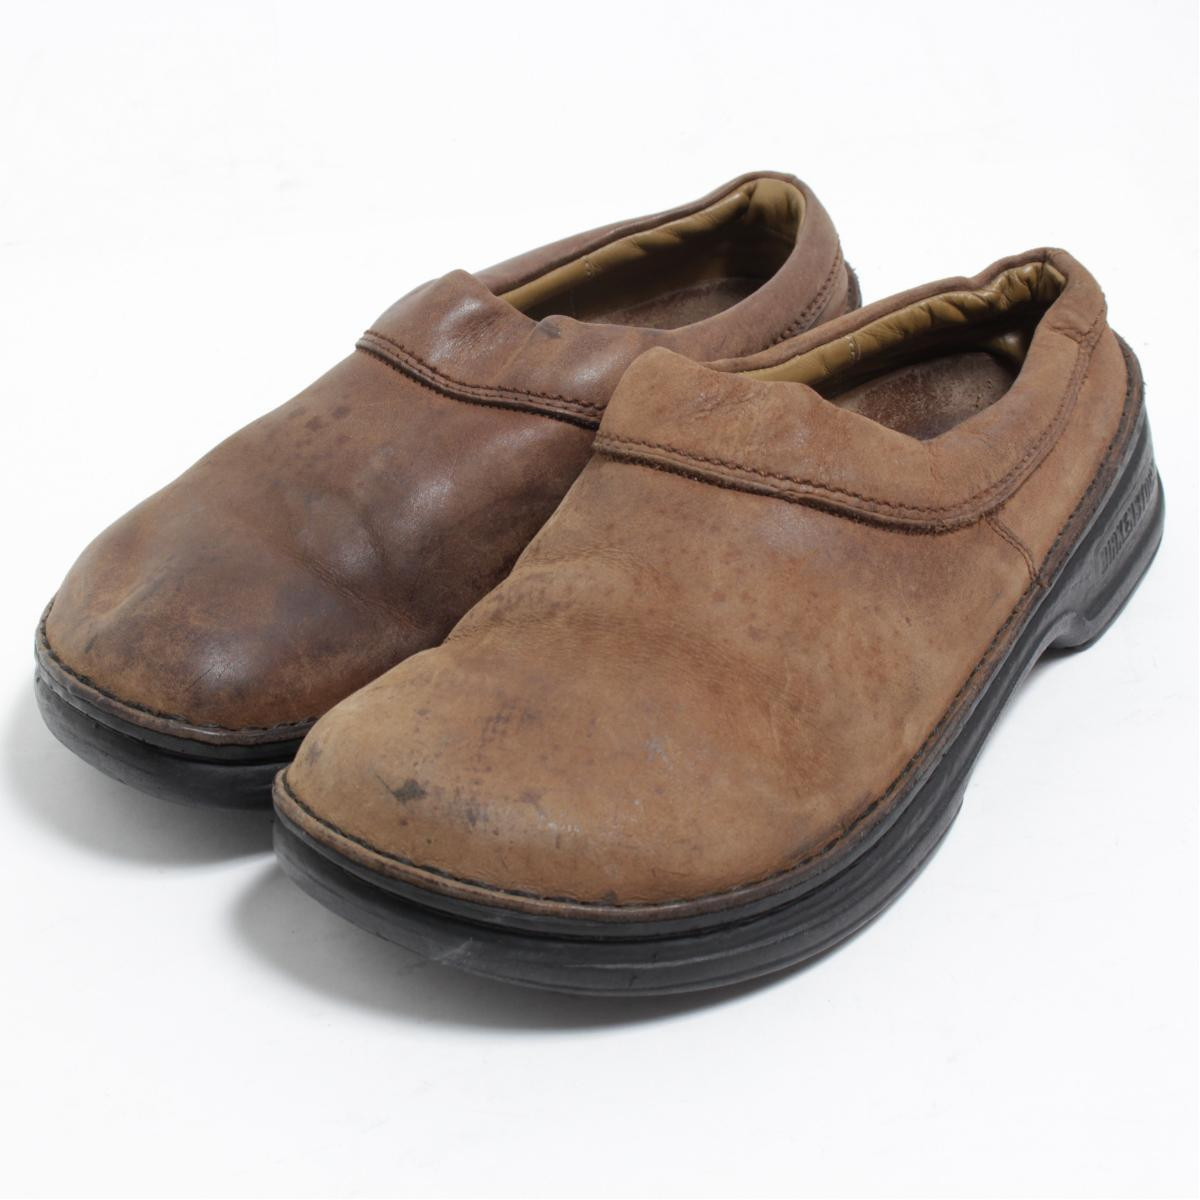 0a5d09e51c8 Product made in ビルケンシュトック BIRKENSTOCK FOOTPRINTS comfort sandals Germany 39  men's 25.0cm /bon0367